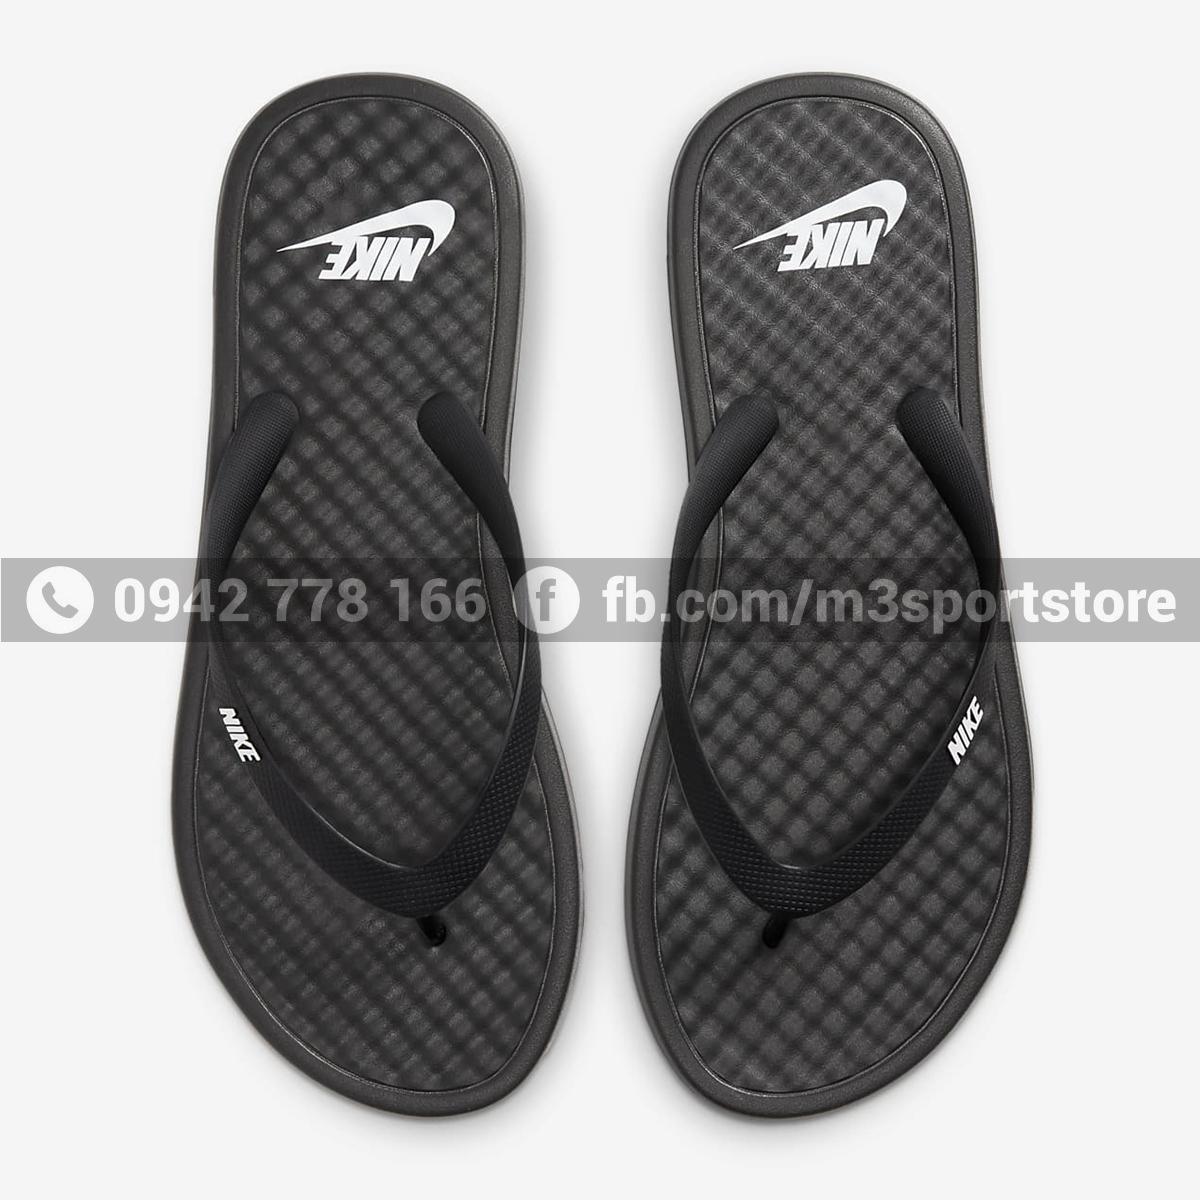 Tông thể thao nam Nike On Deck Men's Flip Flop CU3958